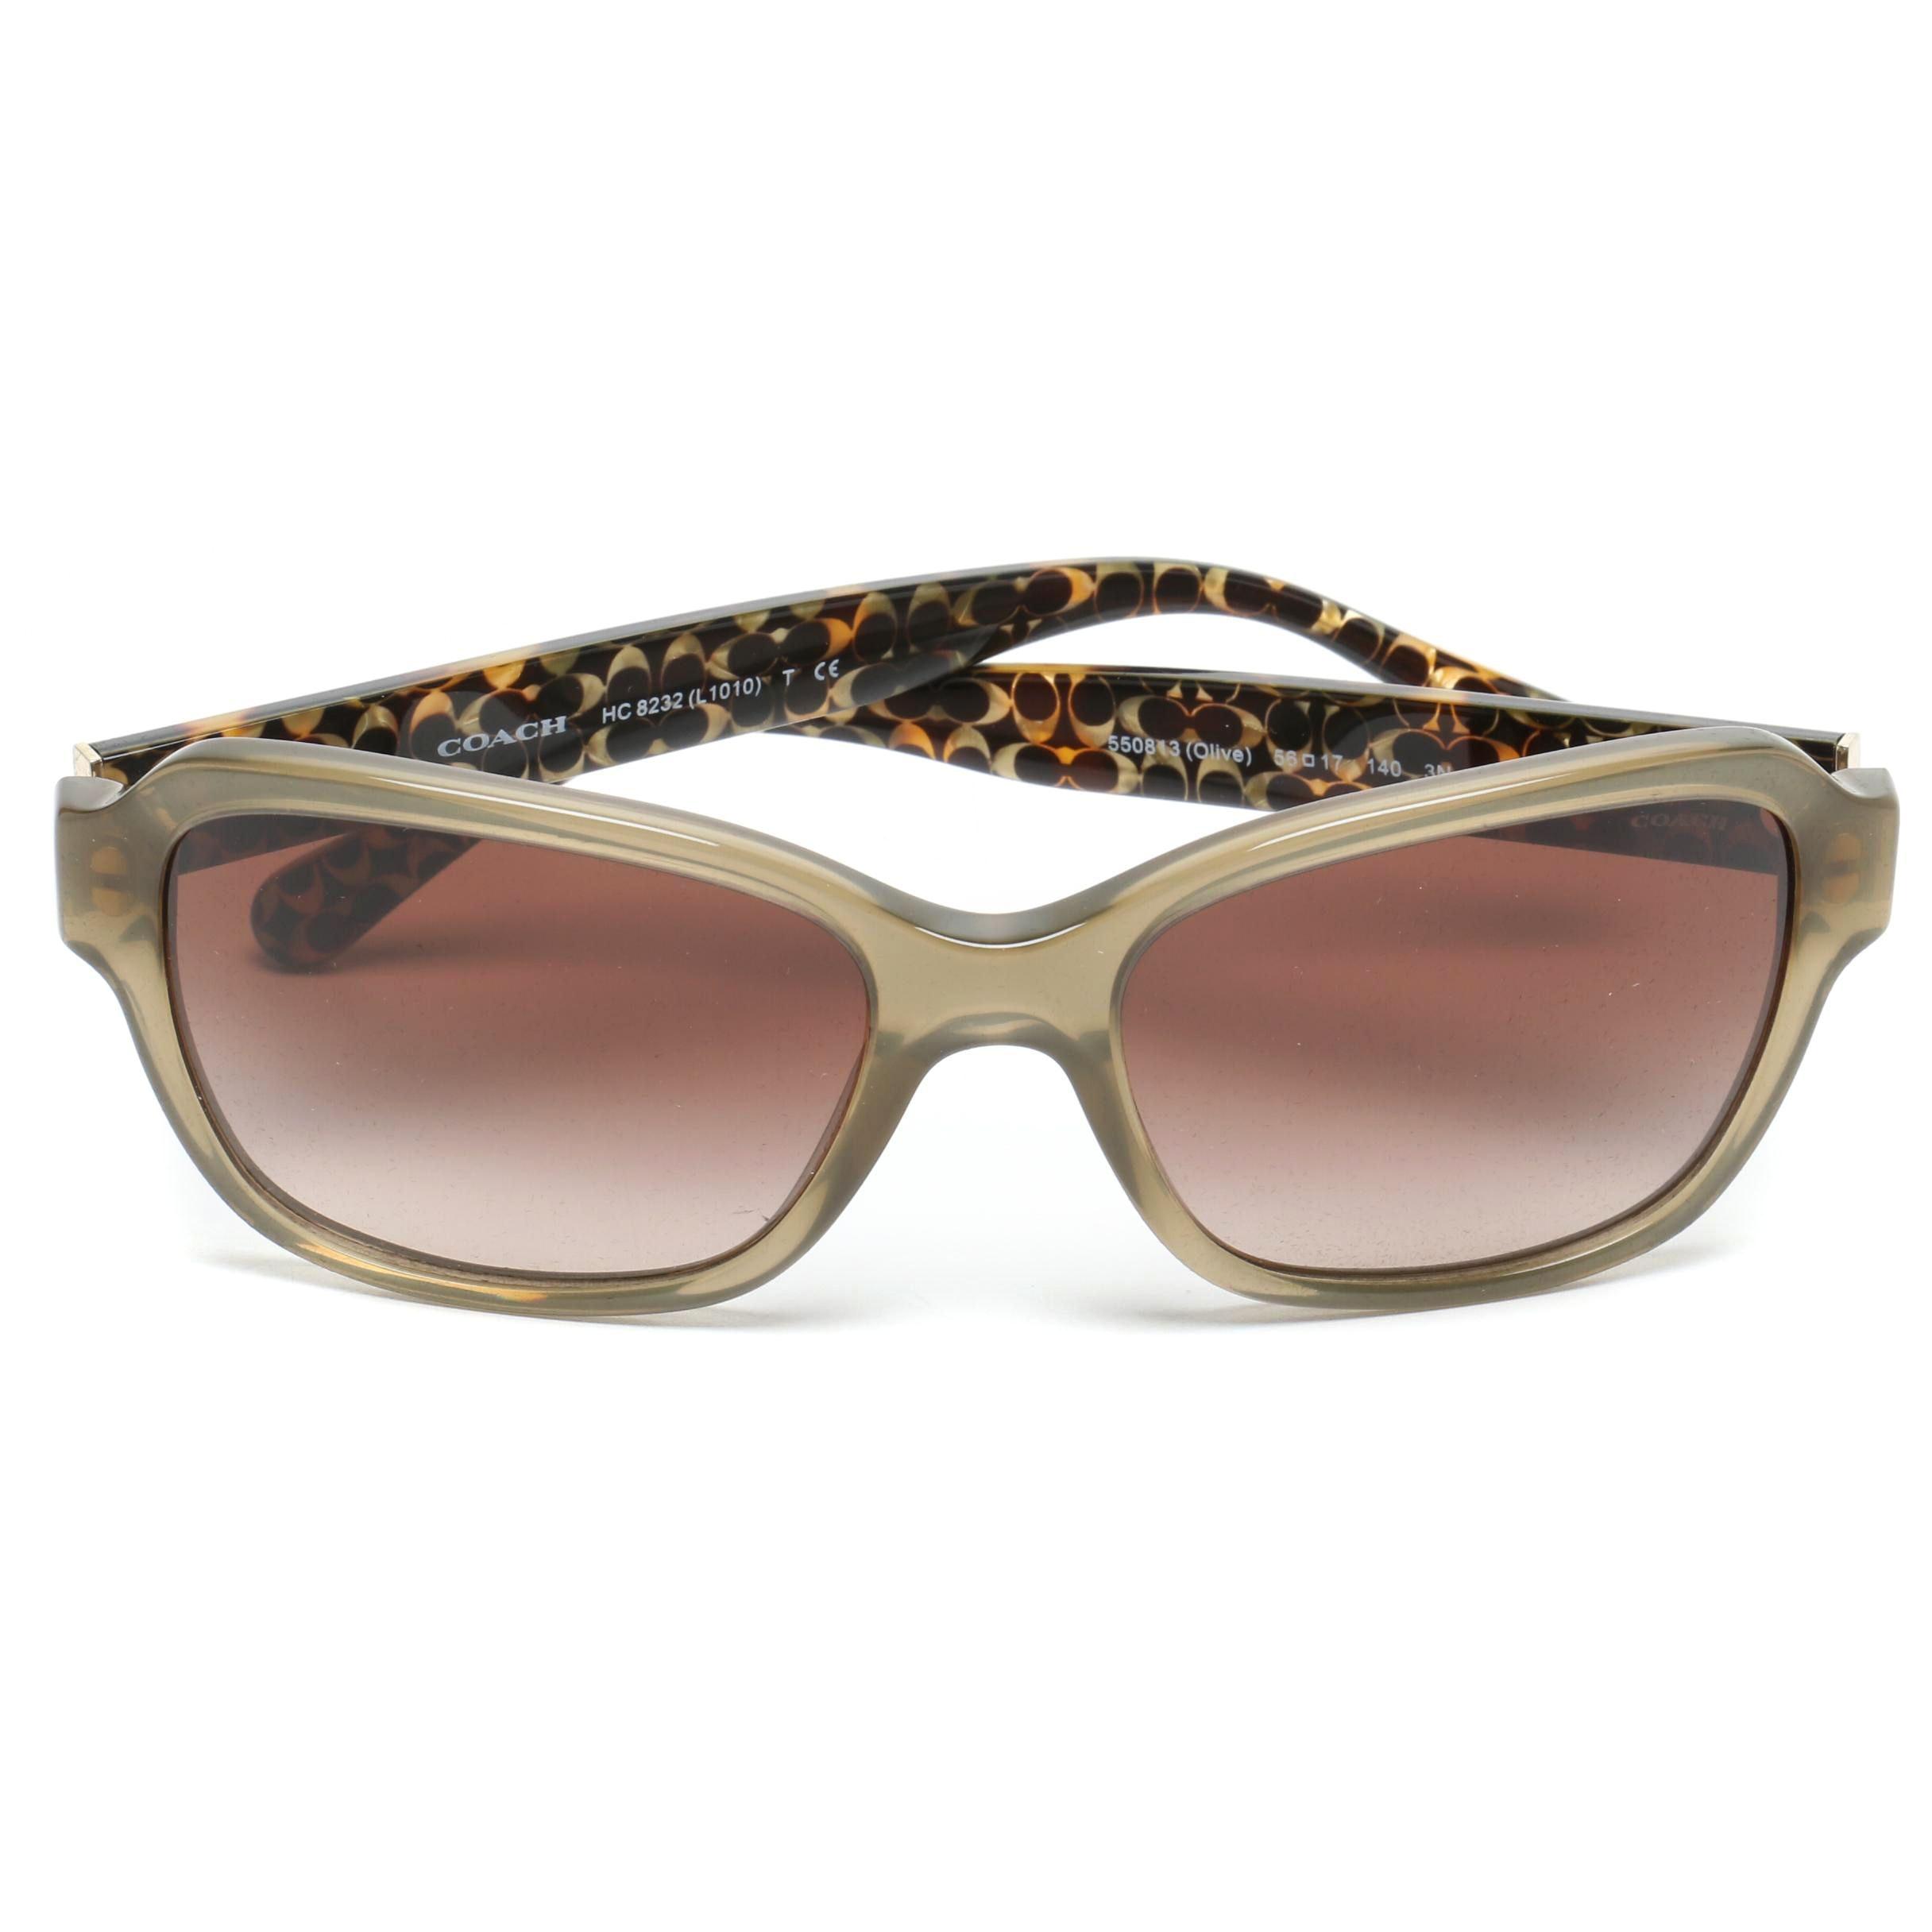 Coach Olive Signature Sunglasses with Case